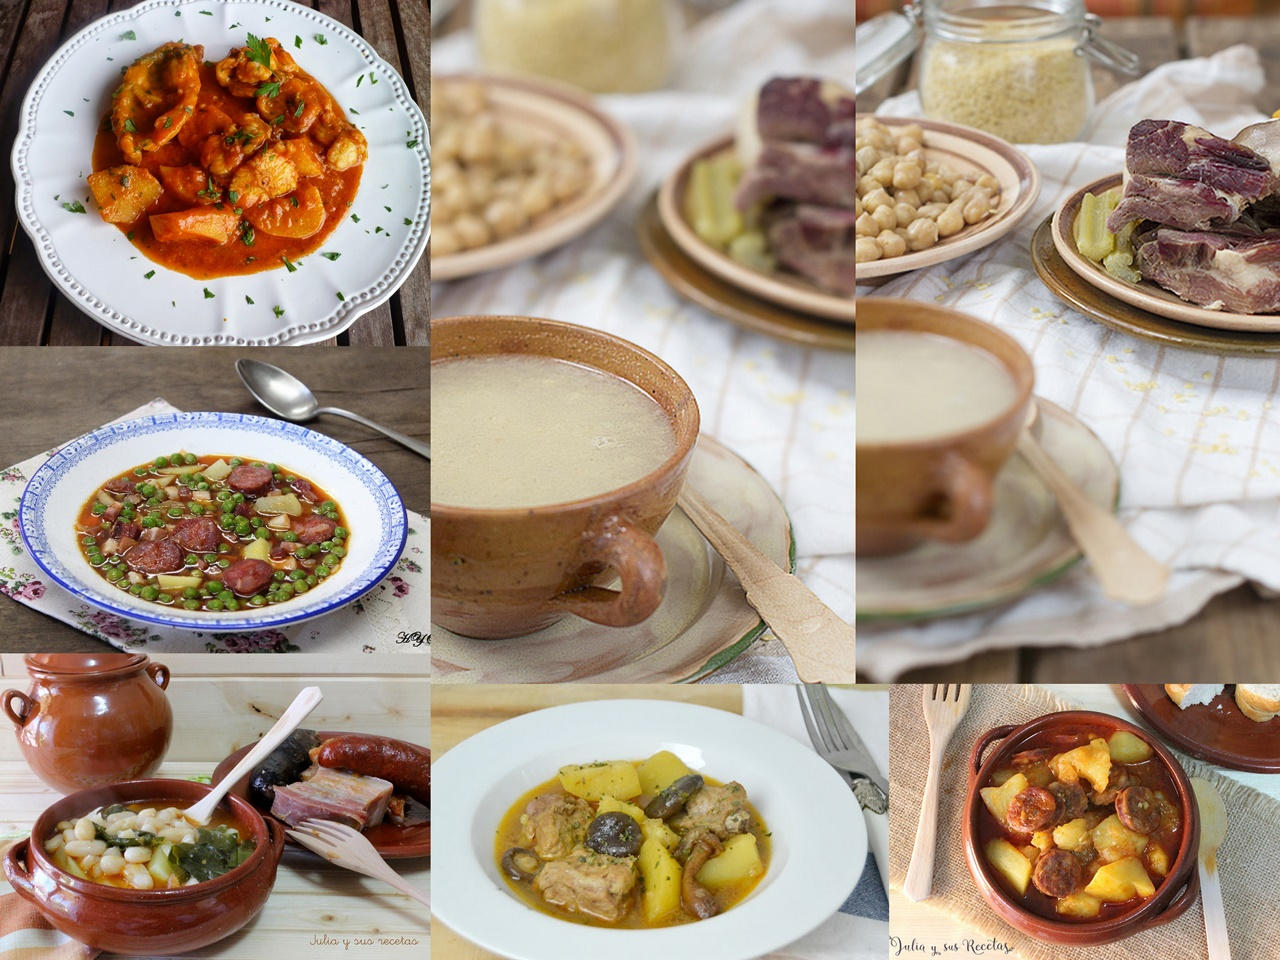 Platos de cuchara para el d a a d a cocina for Platos de cocina